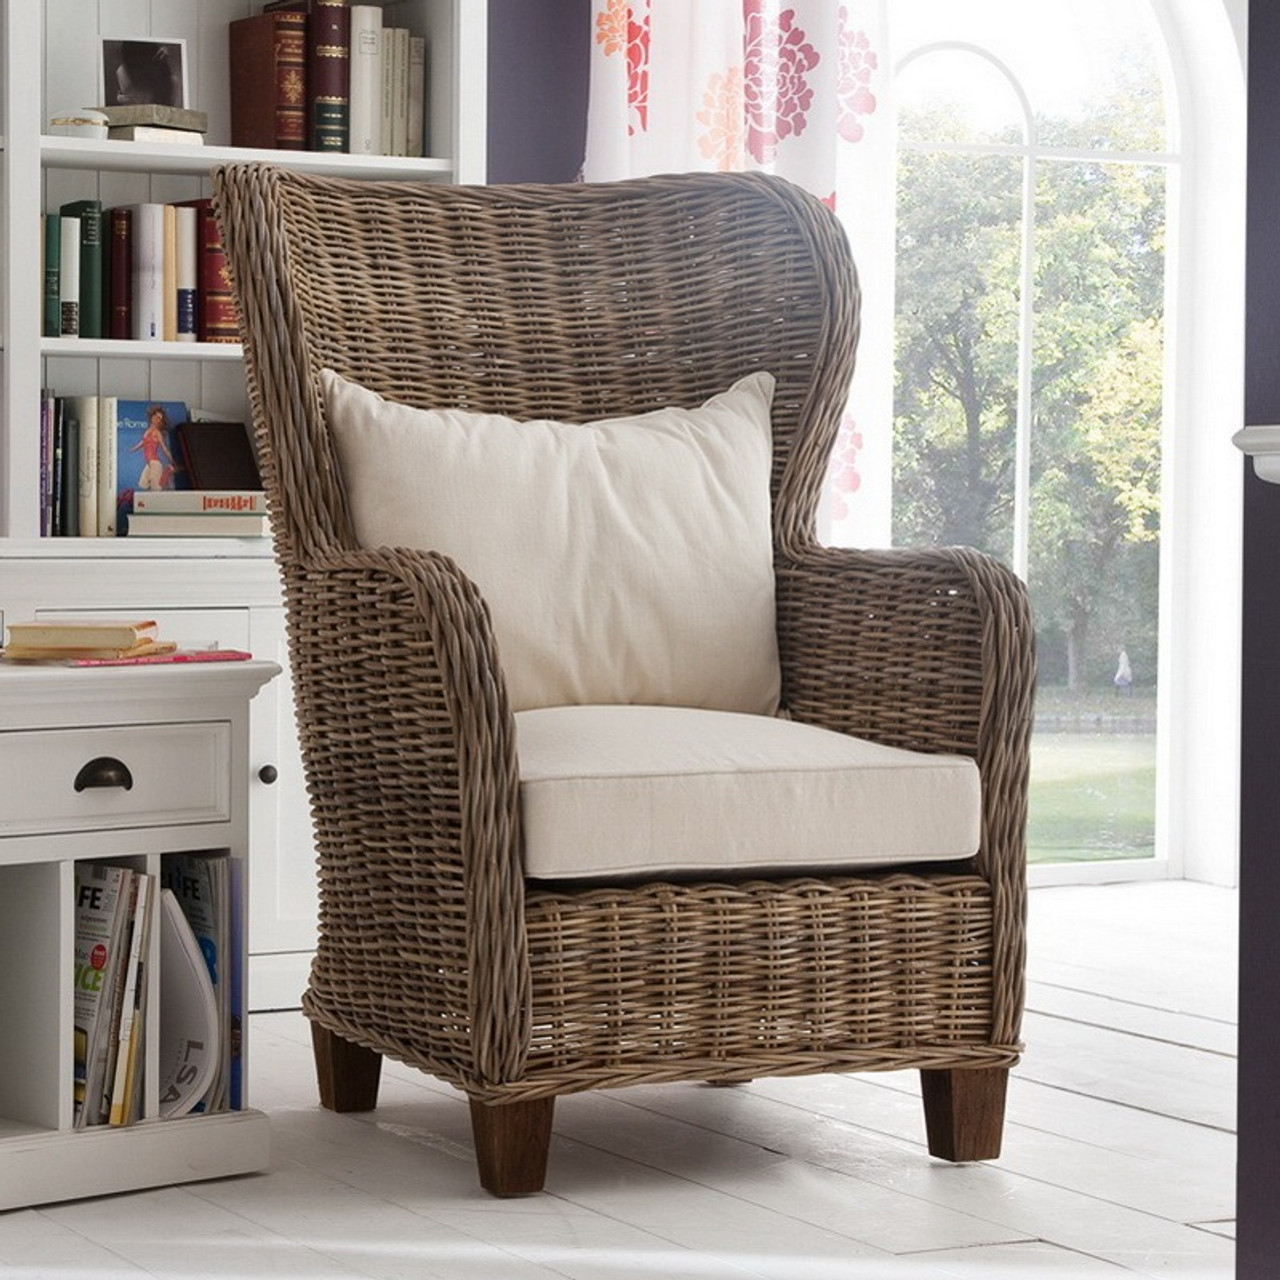 Pleasant Garry Coastal Rattan Wingback Accent Chair Bralicious Painted Fabric Chair Ideas Braliciousco